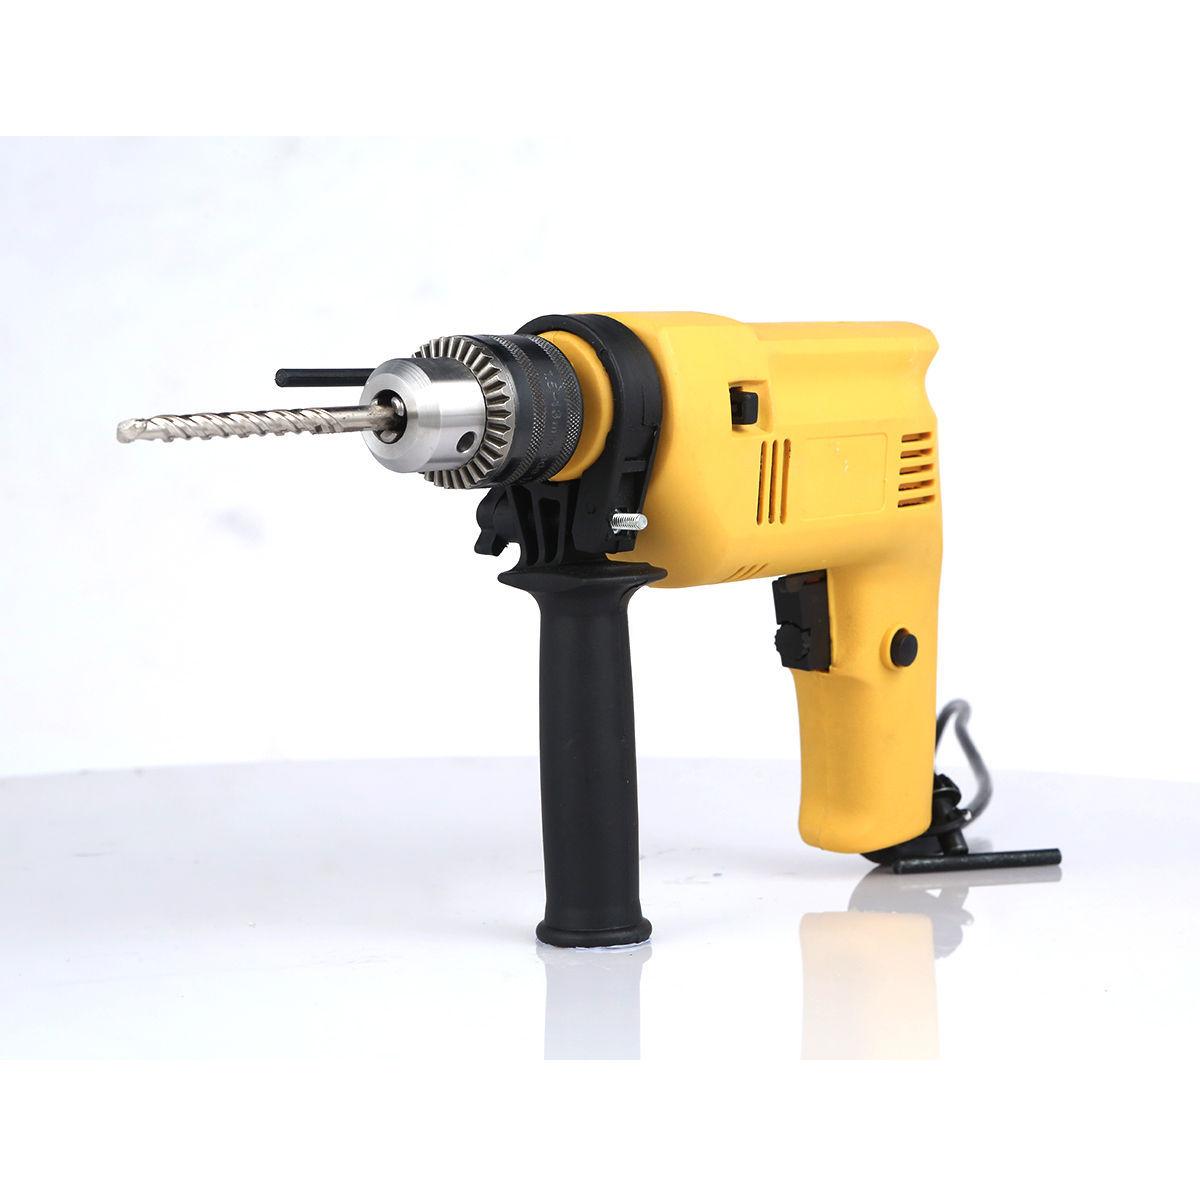 Hot Deals Store : Buy Hammer Drill Machine + 100 Pcs Tool ...